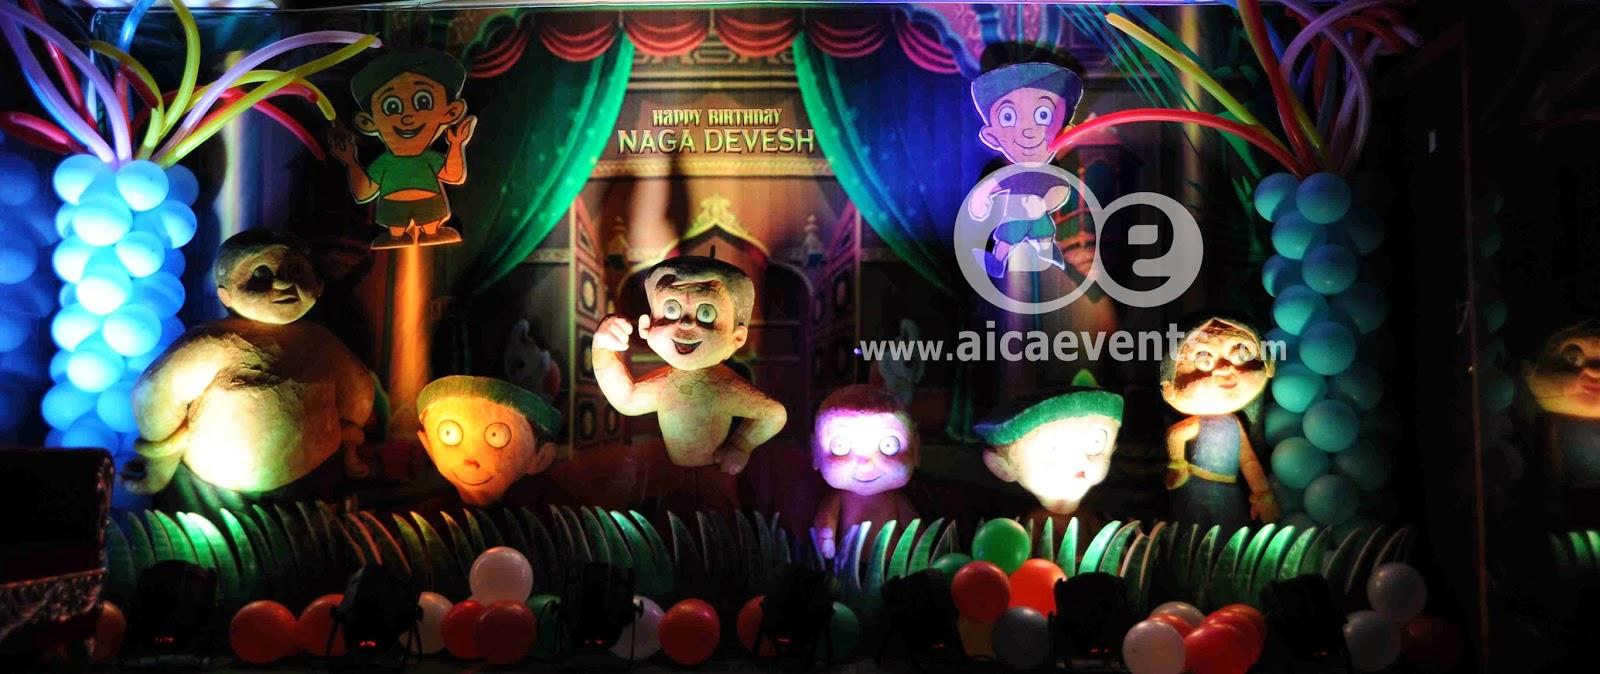 Aicaevents India Chhota Bheem Theme Decorations